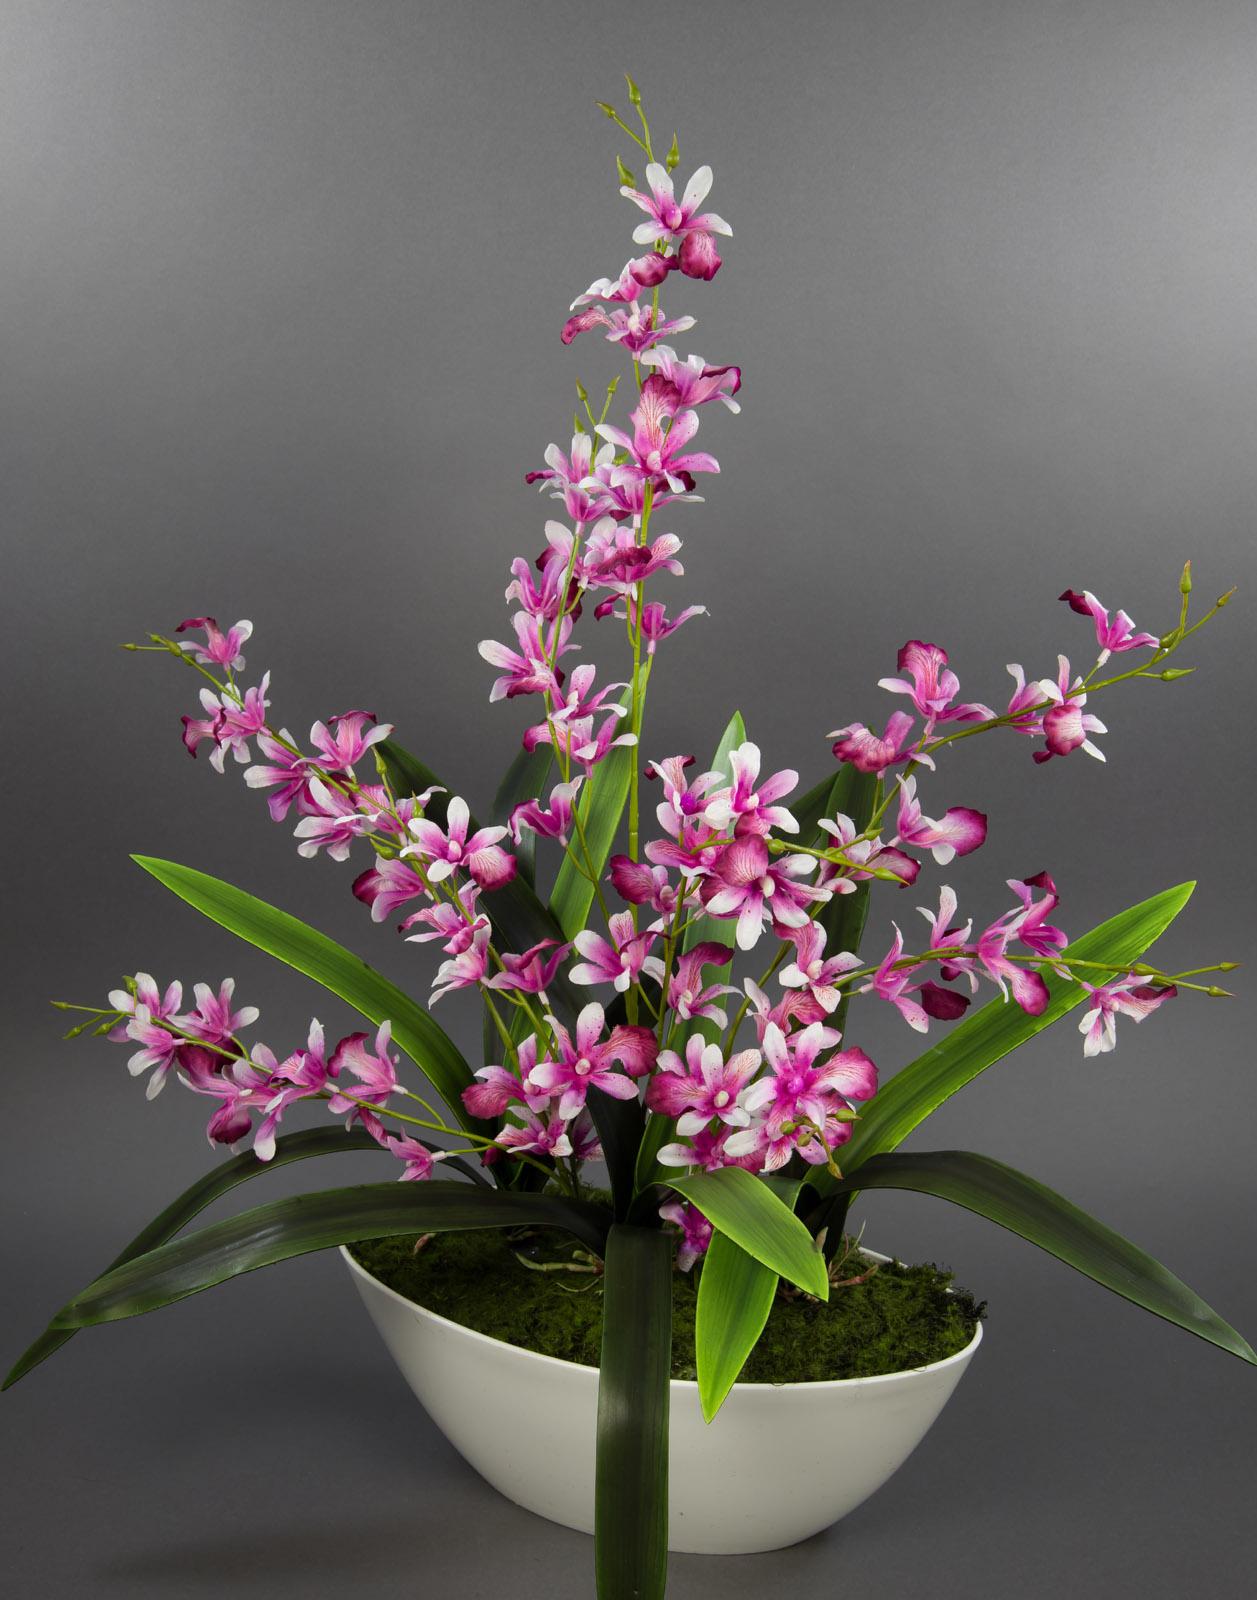 Orchideen arrangement 70x55cm fuchsia creme in wei er dekoschale ga kunstblumen ebay - Orchideen arrangement ...